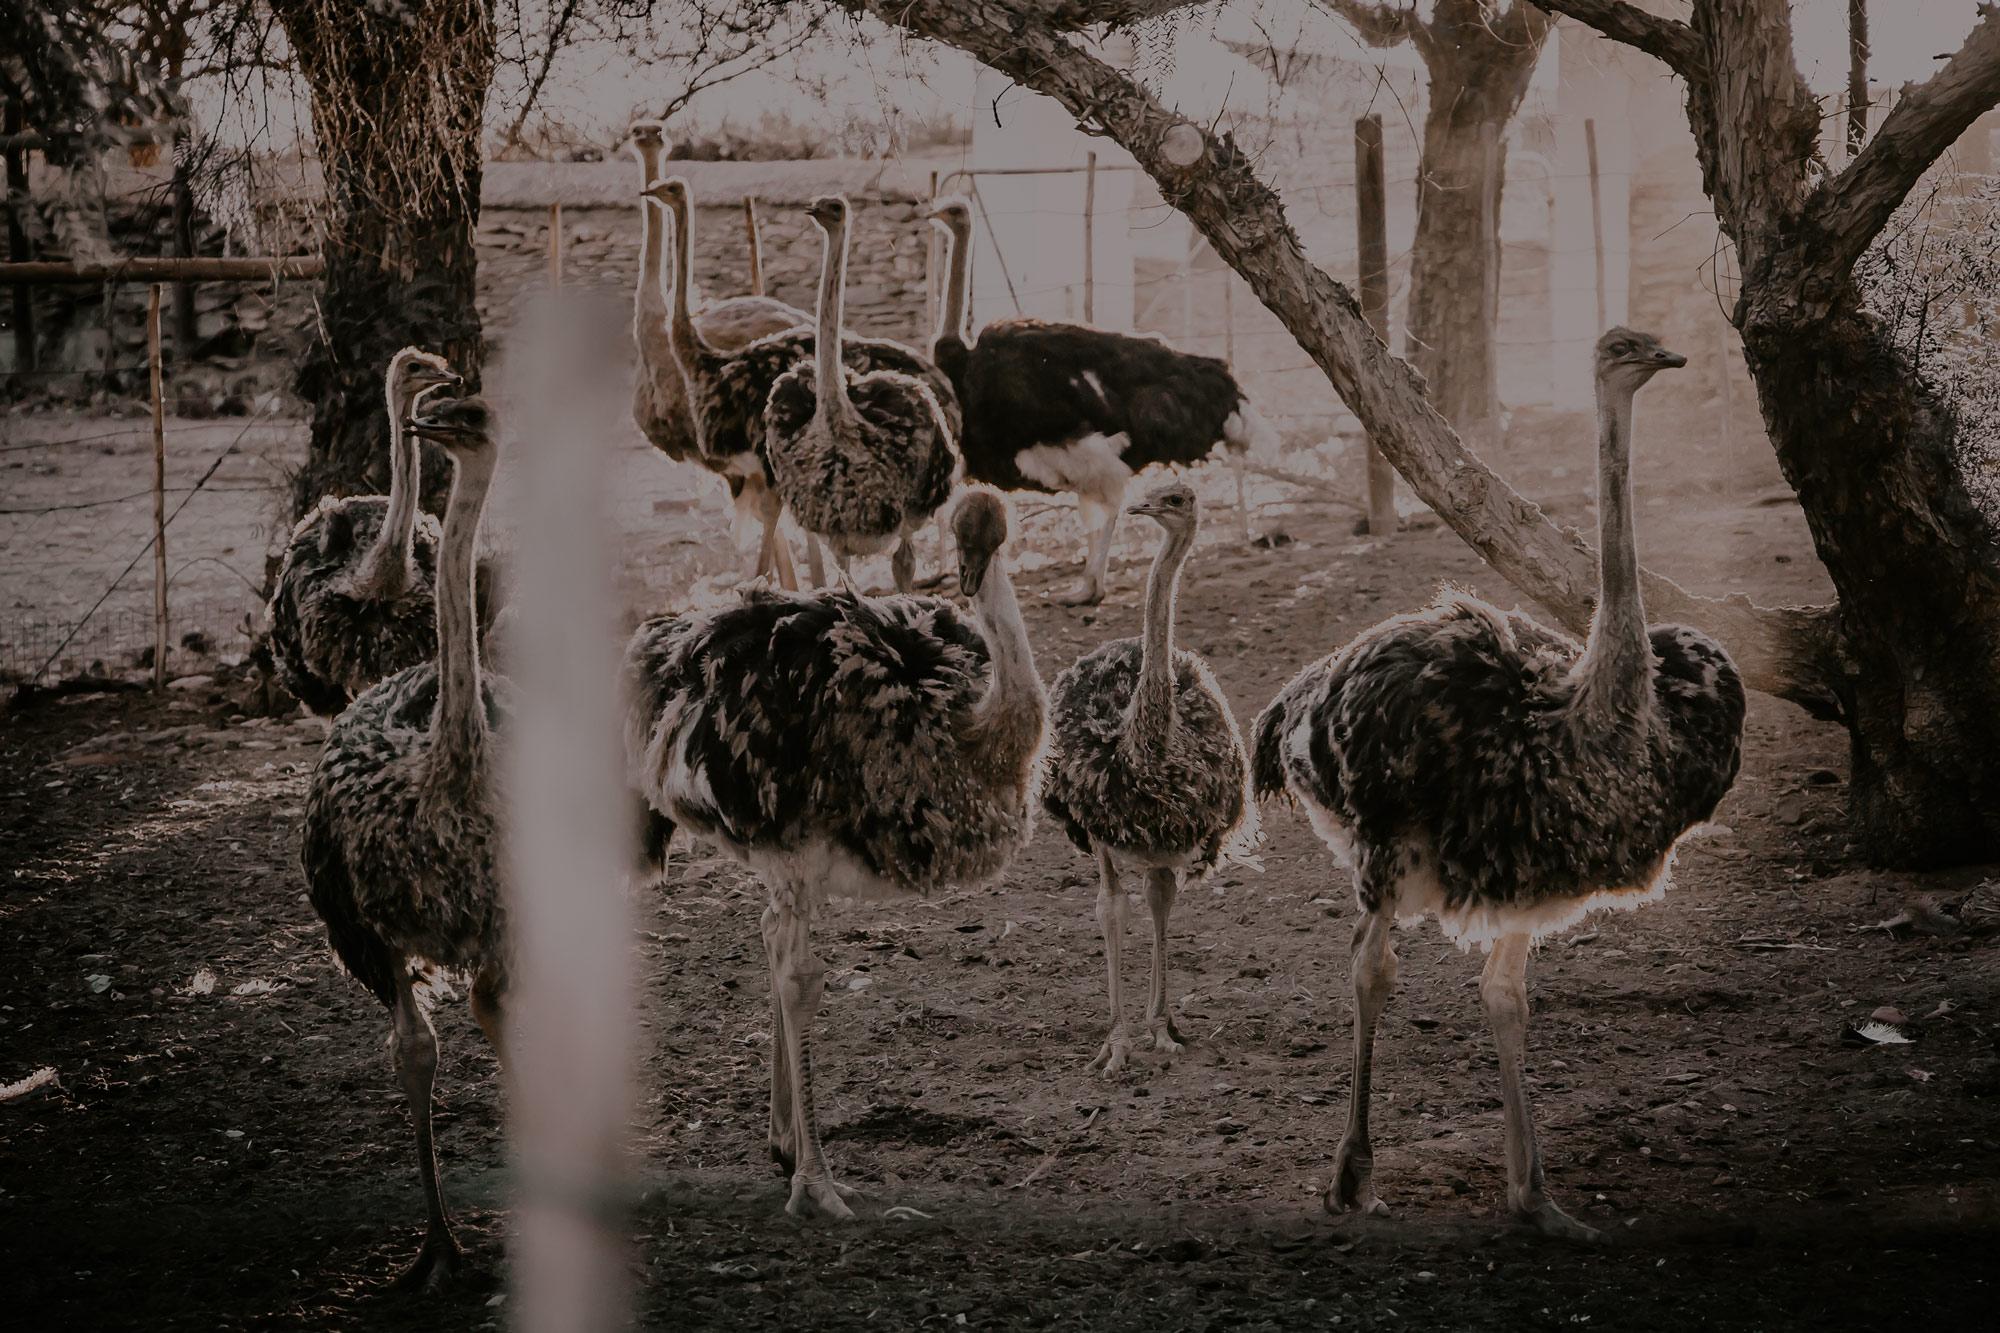 Chandelier Ostrich Show Farm